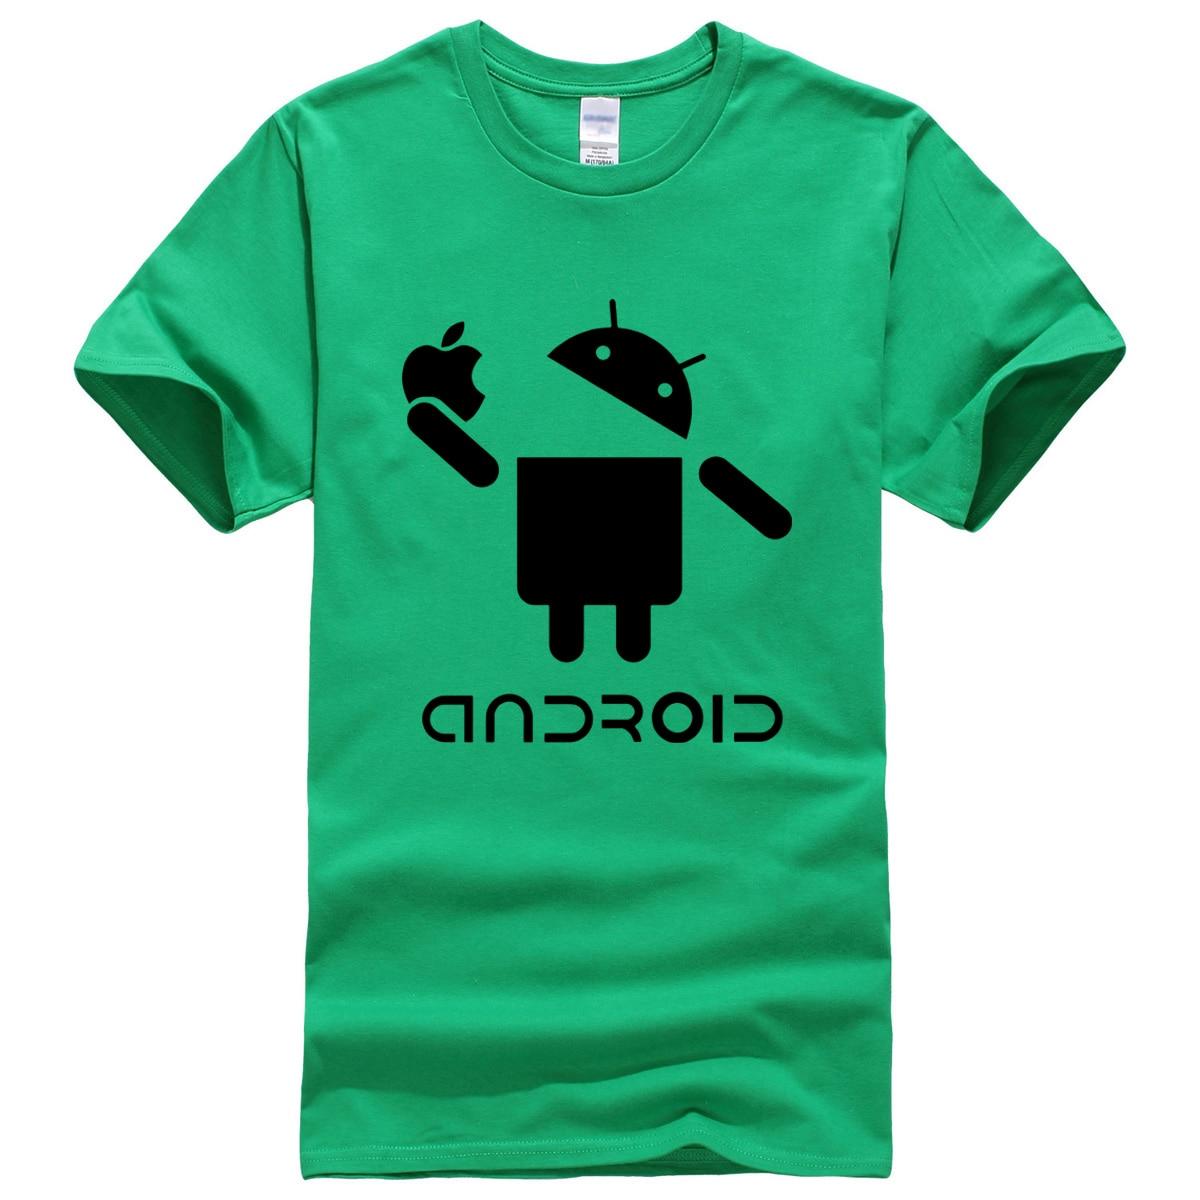 Android character pattern summer 2019 T-shirt cotton new hot sale men's T-shirts fashion casual t shirt harajuku crossfit brand 5